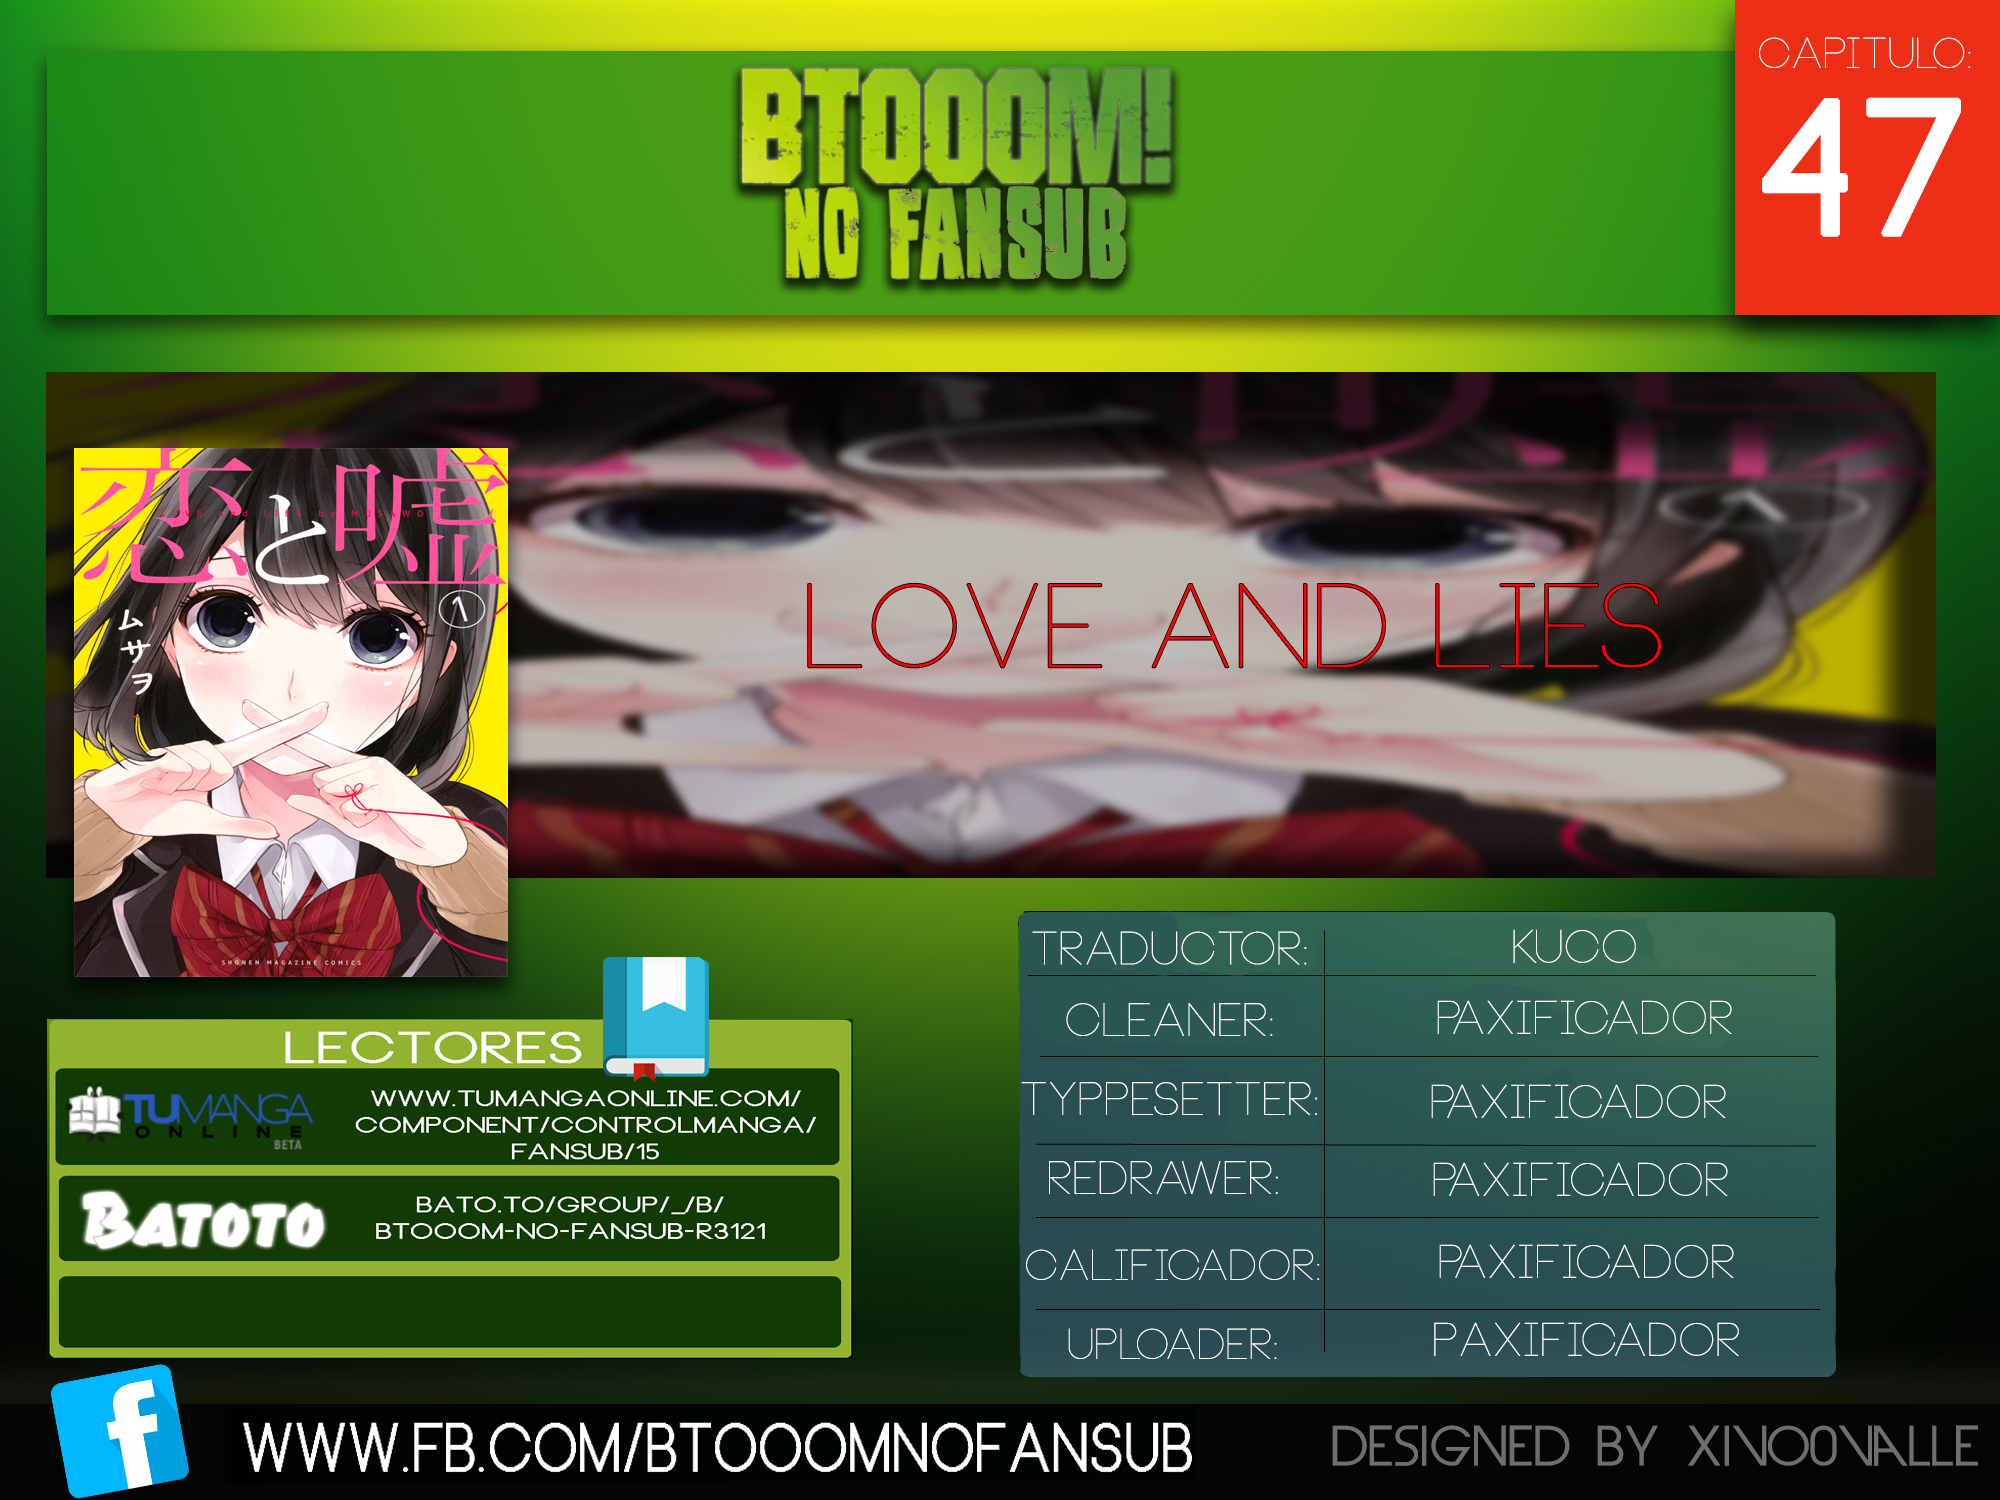 http://c5.ninemanga.com/es_manga/14/14734/392919/af8370971ad8f7eb19e92d3ceecec960.jpg Page 1